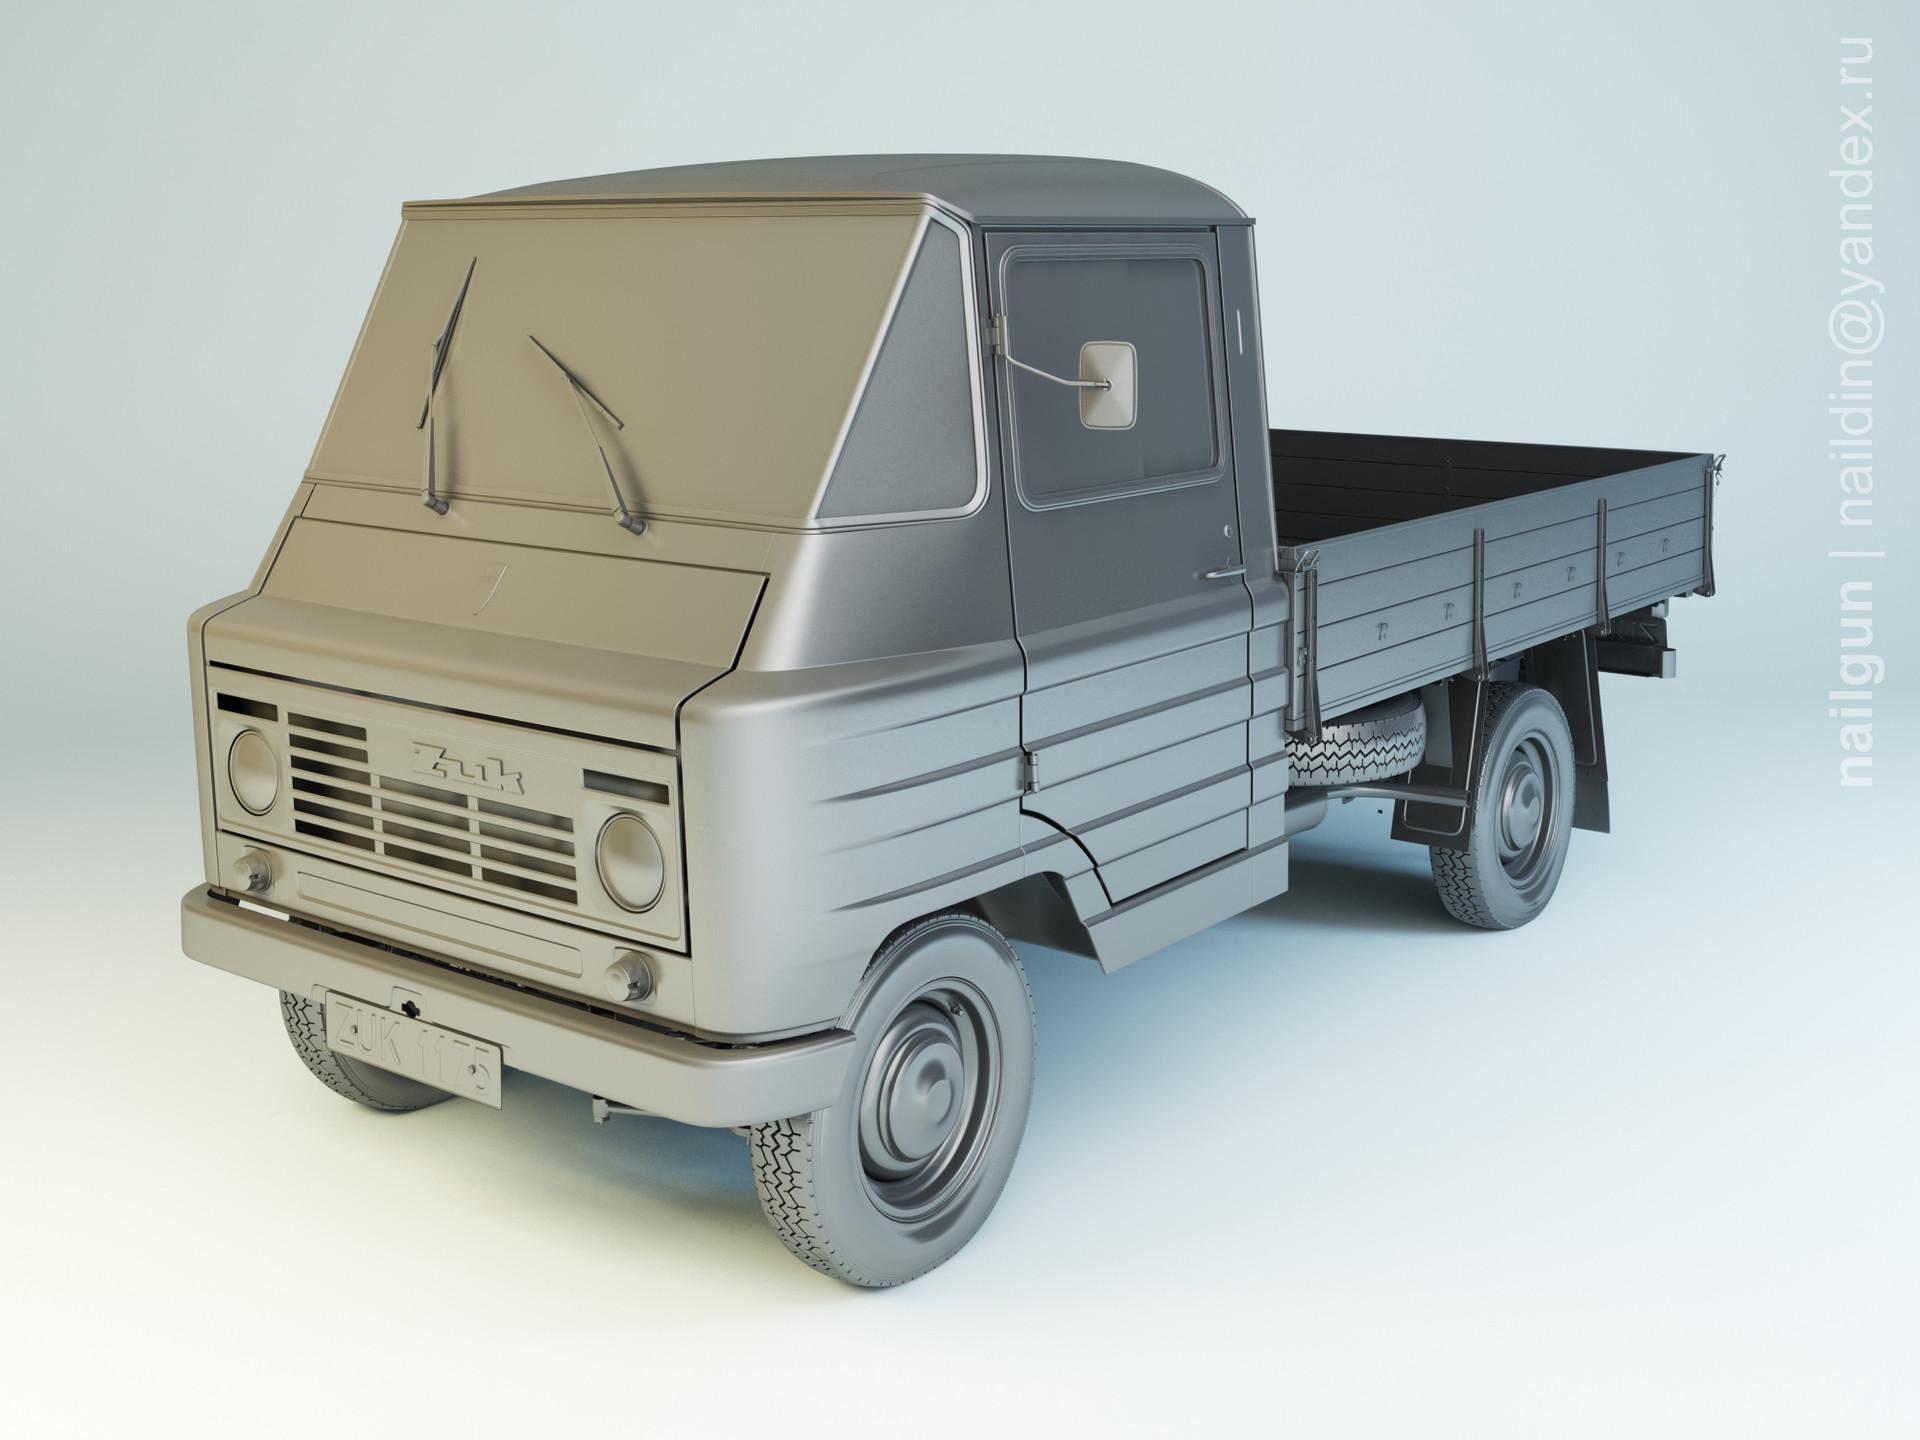 Nail khusnutdinov als 163 002 zuk a11 modelling 0